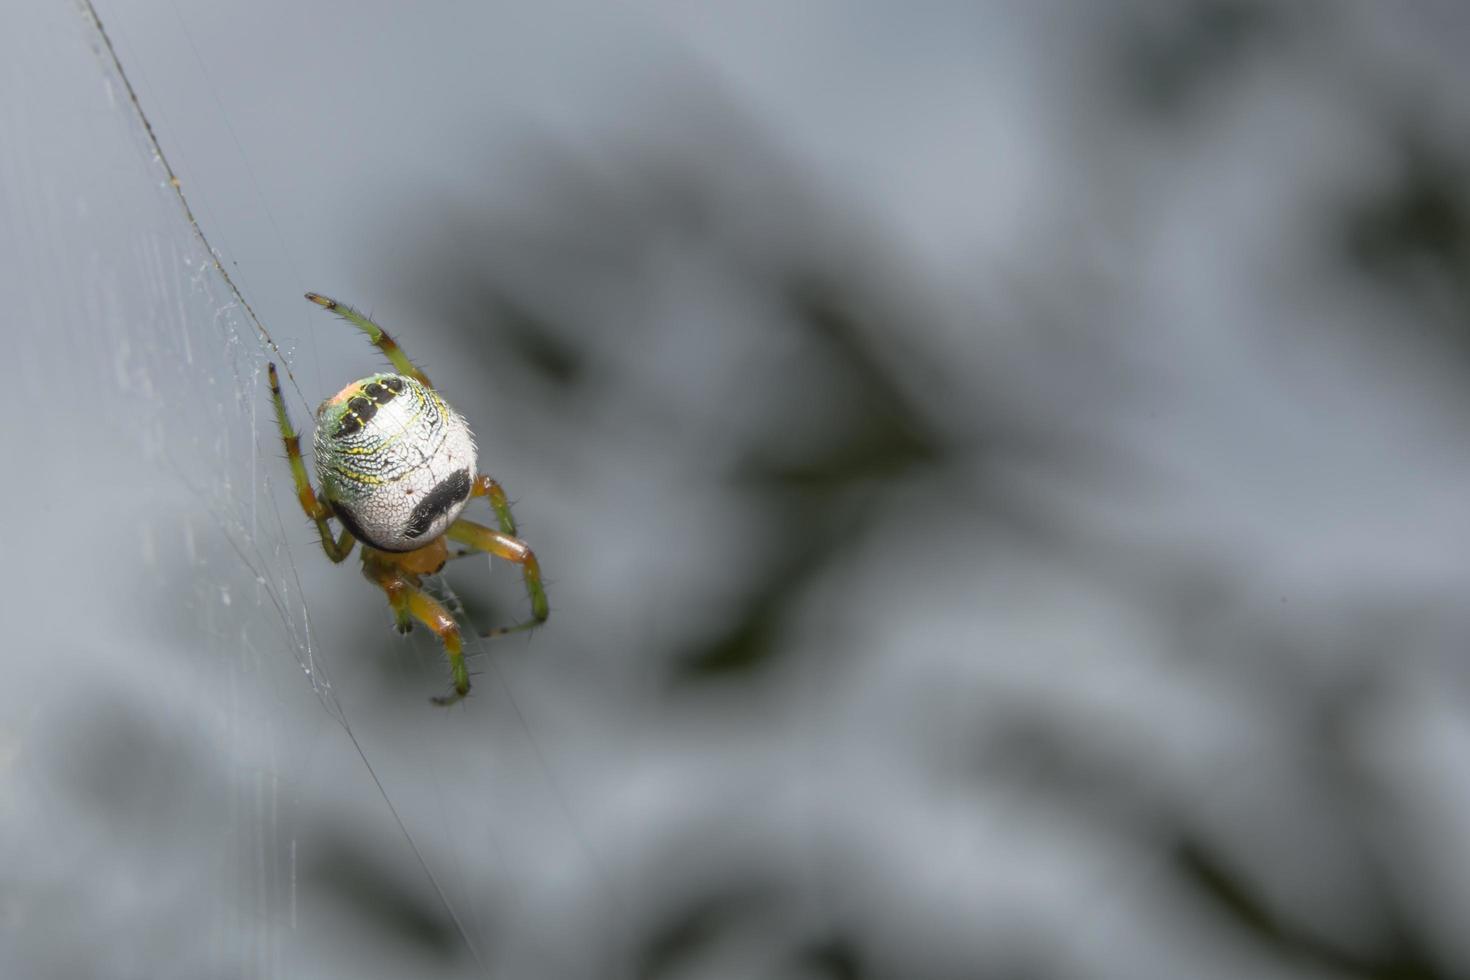 Spider, close-up photo